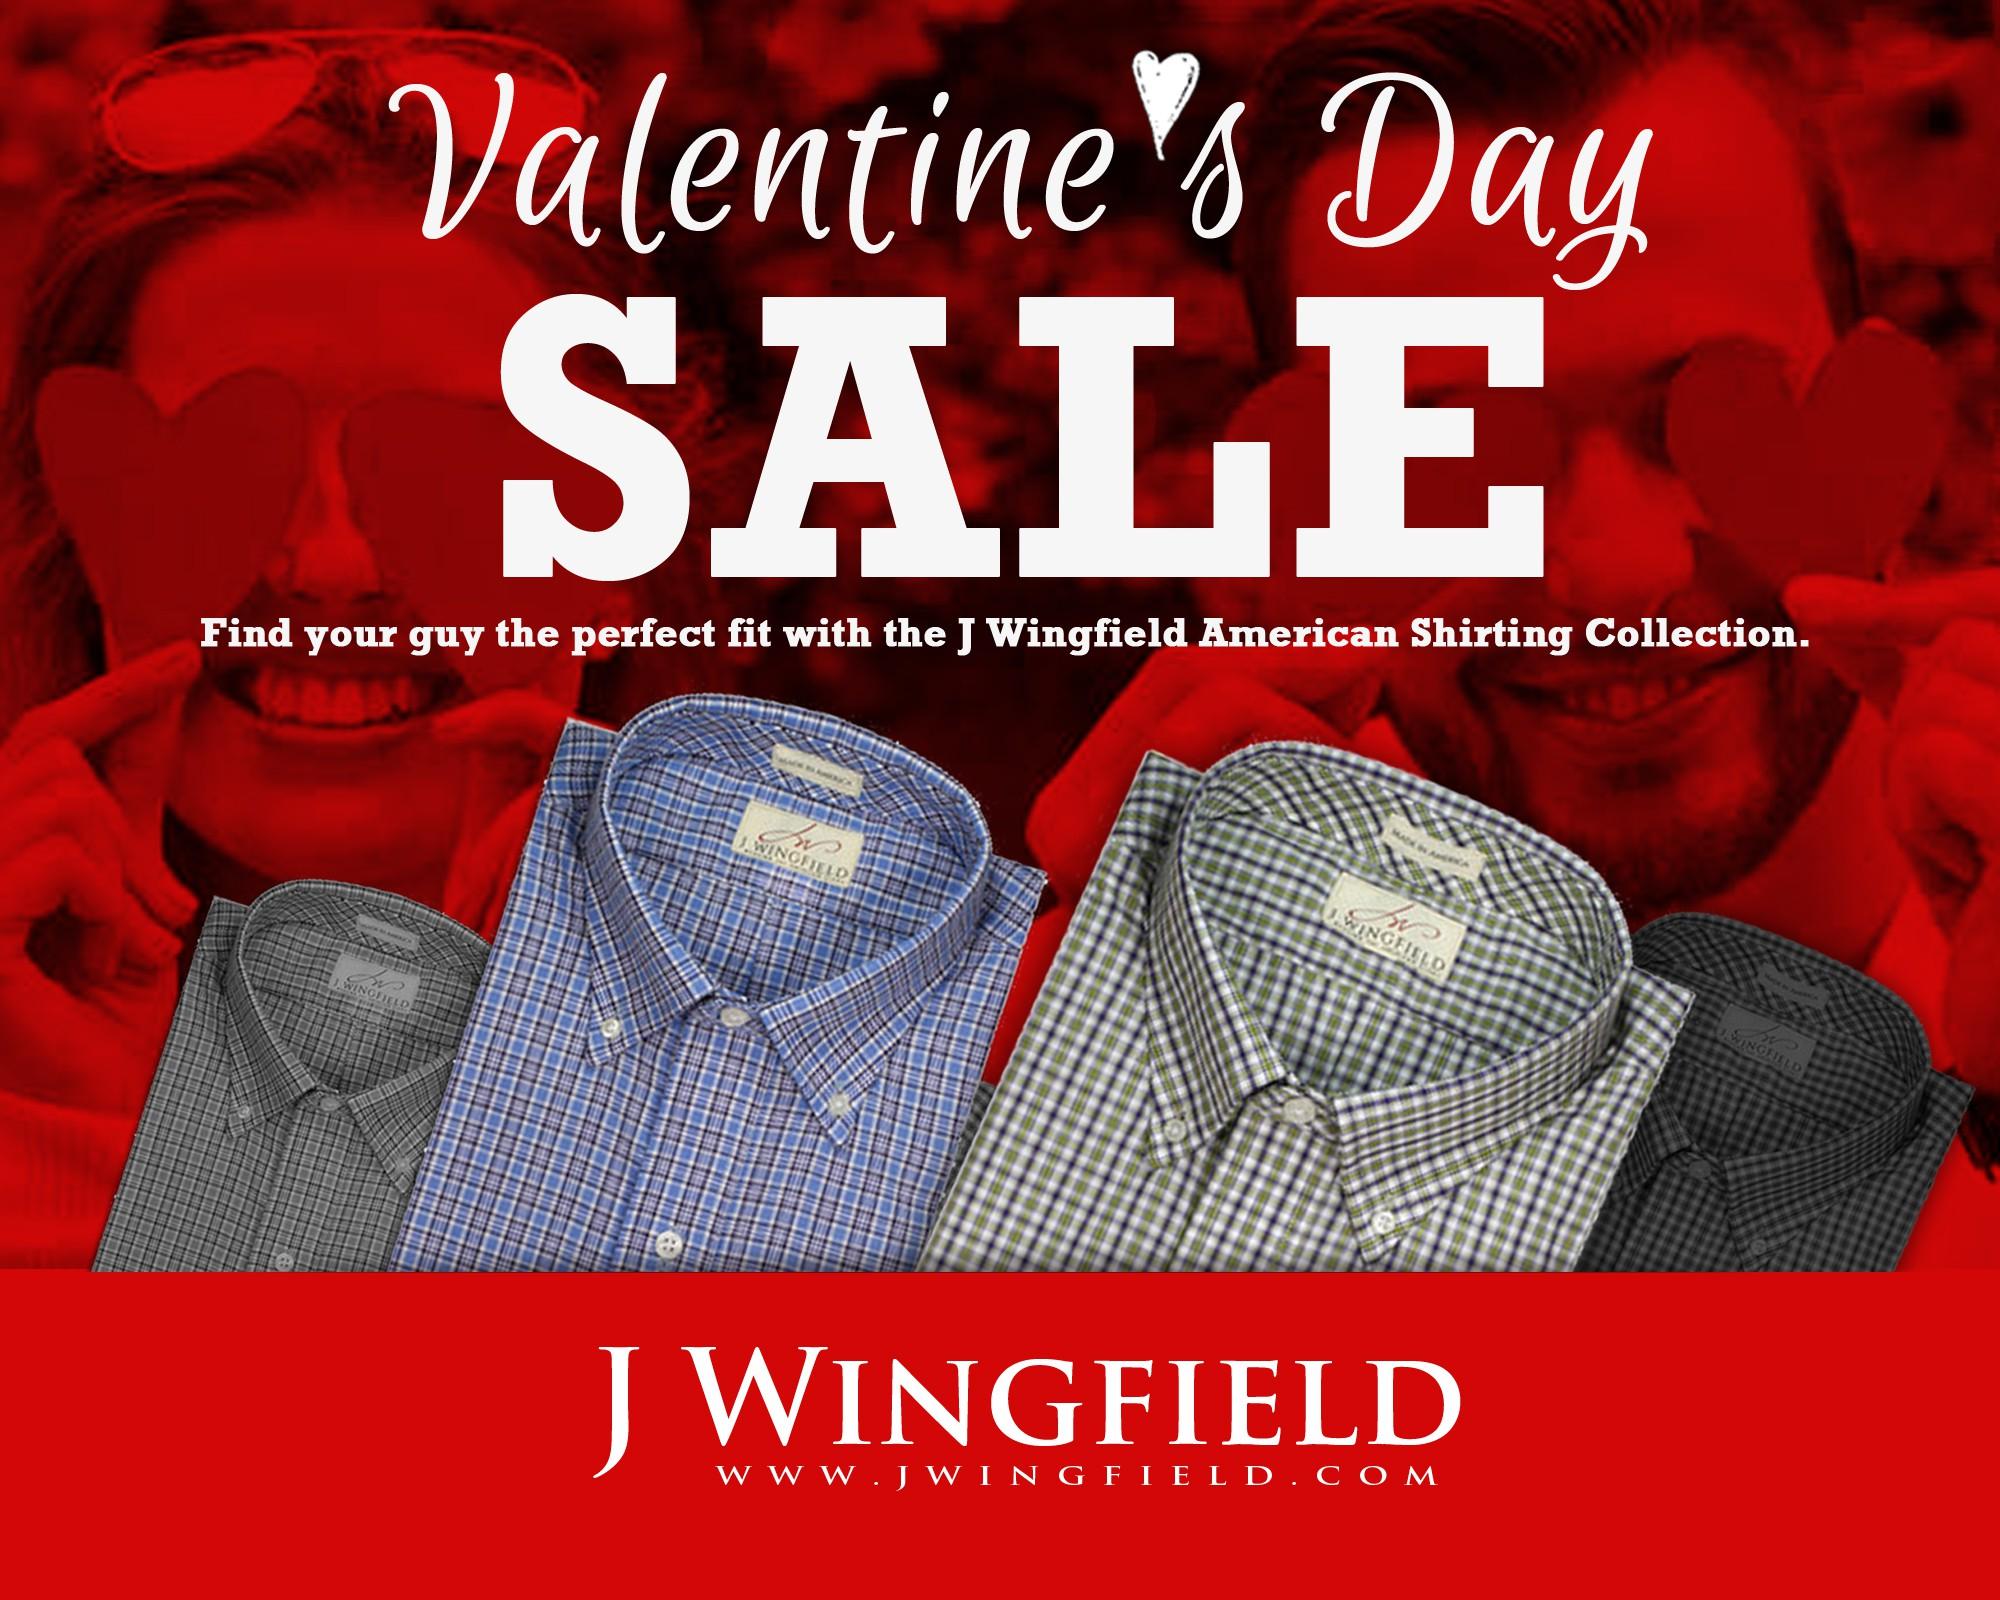 J Wingfield - Valentines Day